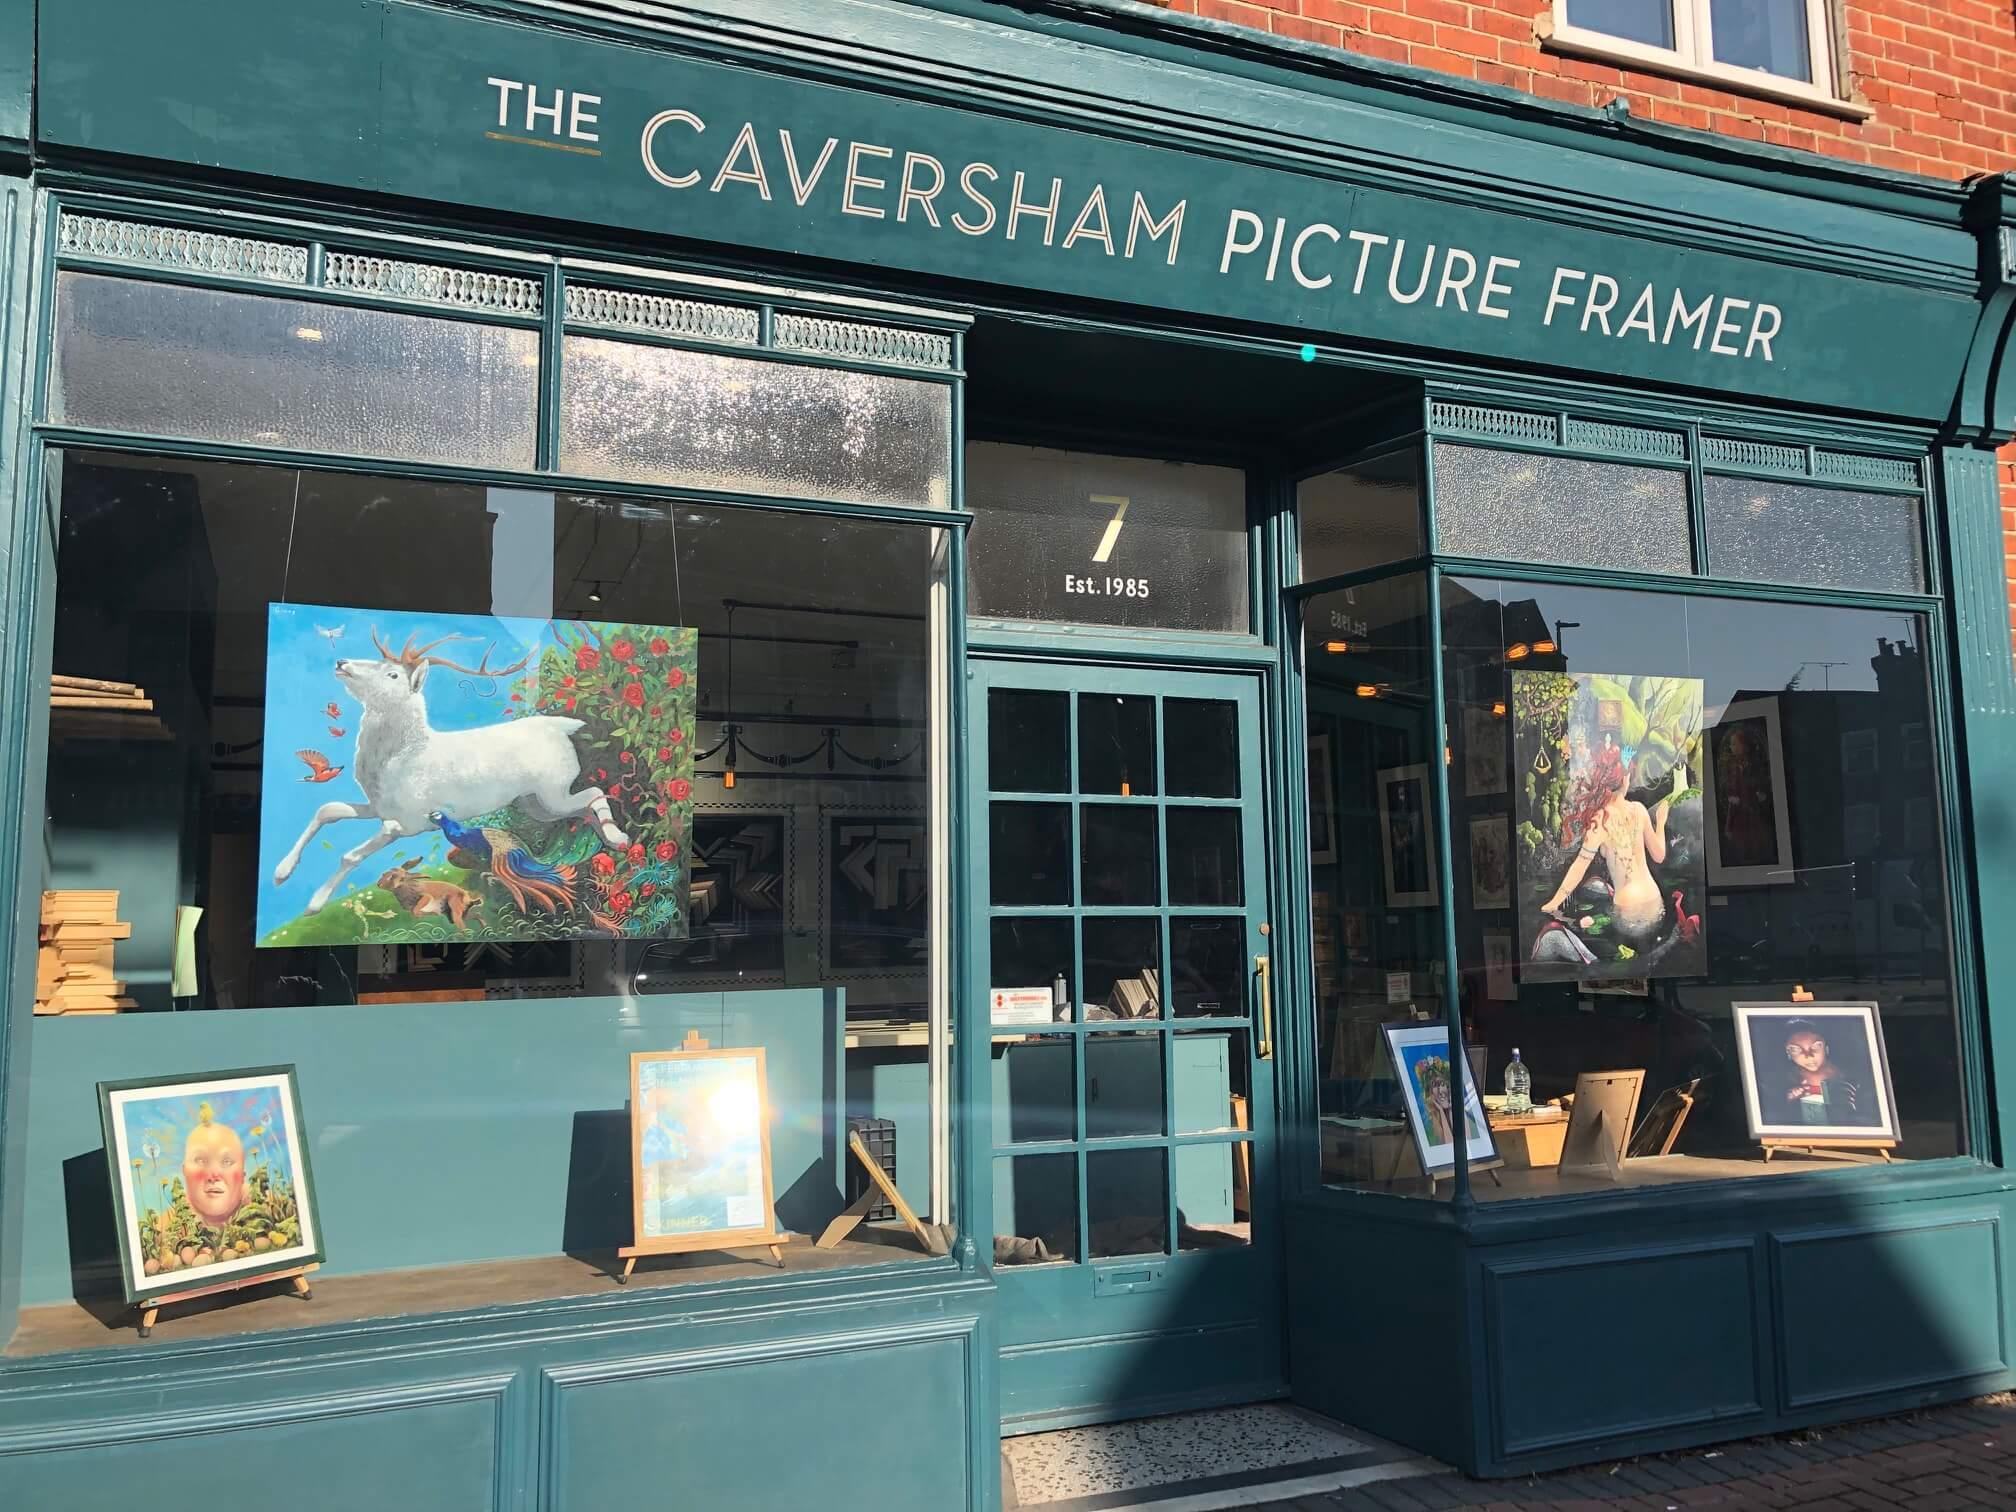 The Caversham Picture Framer, Ginny Skinner Exhibition